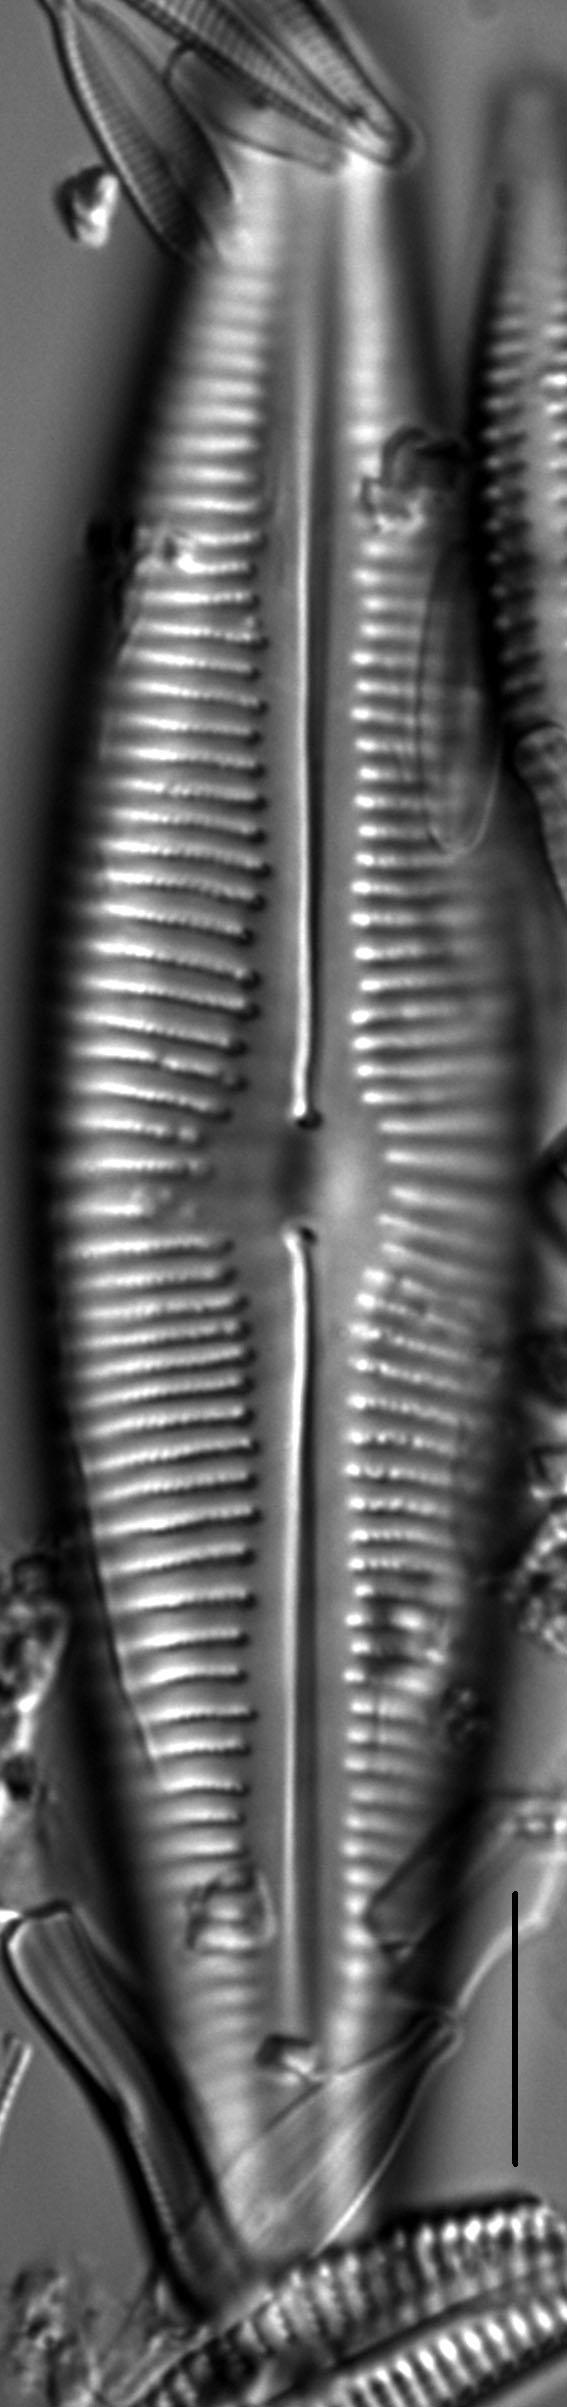 Cymbopleura lata LM1